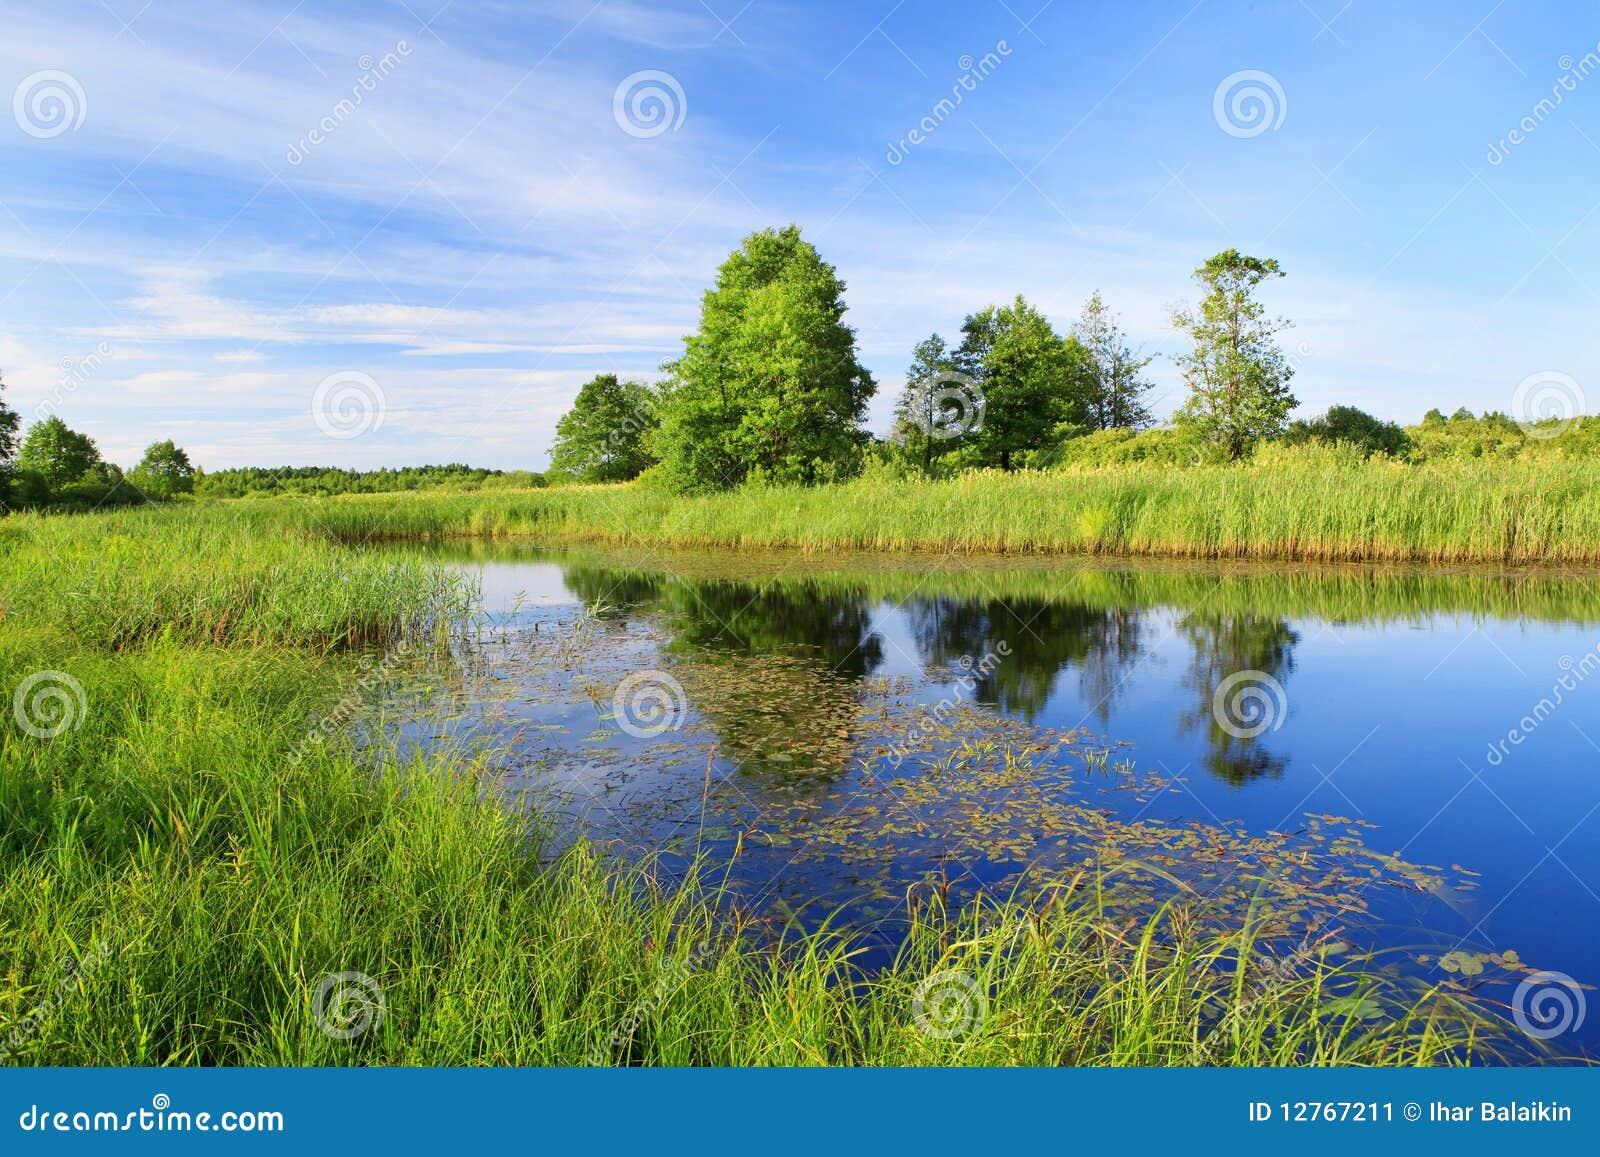 Beautiful panorama of the river